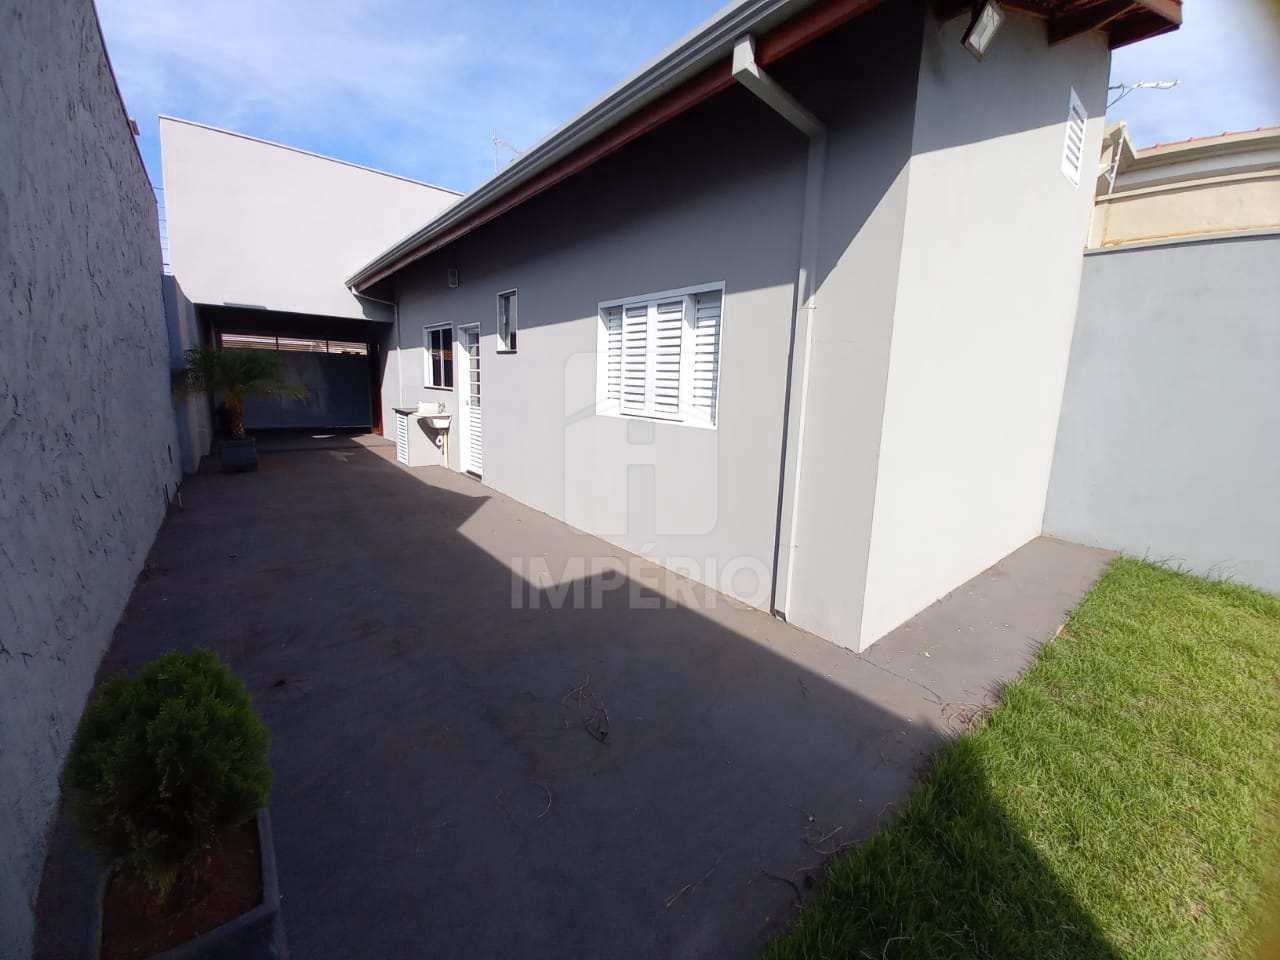 Casa com 1 dorm, Jardim Dona Emília, Jaú - R$ 198 mil, Cod: 450